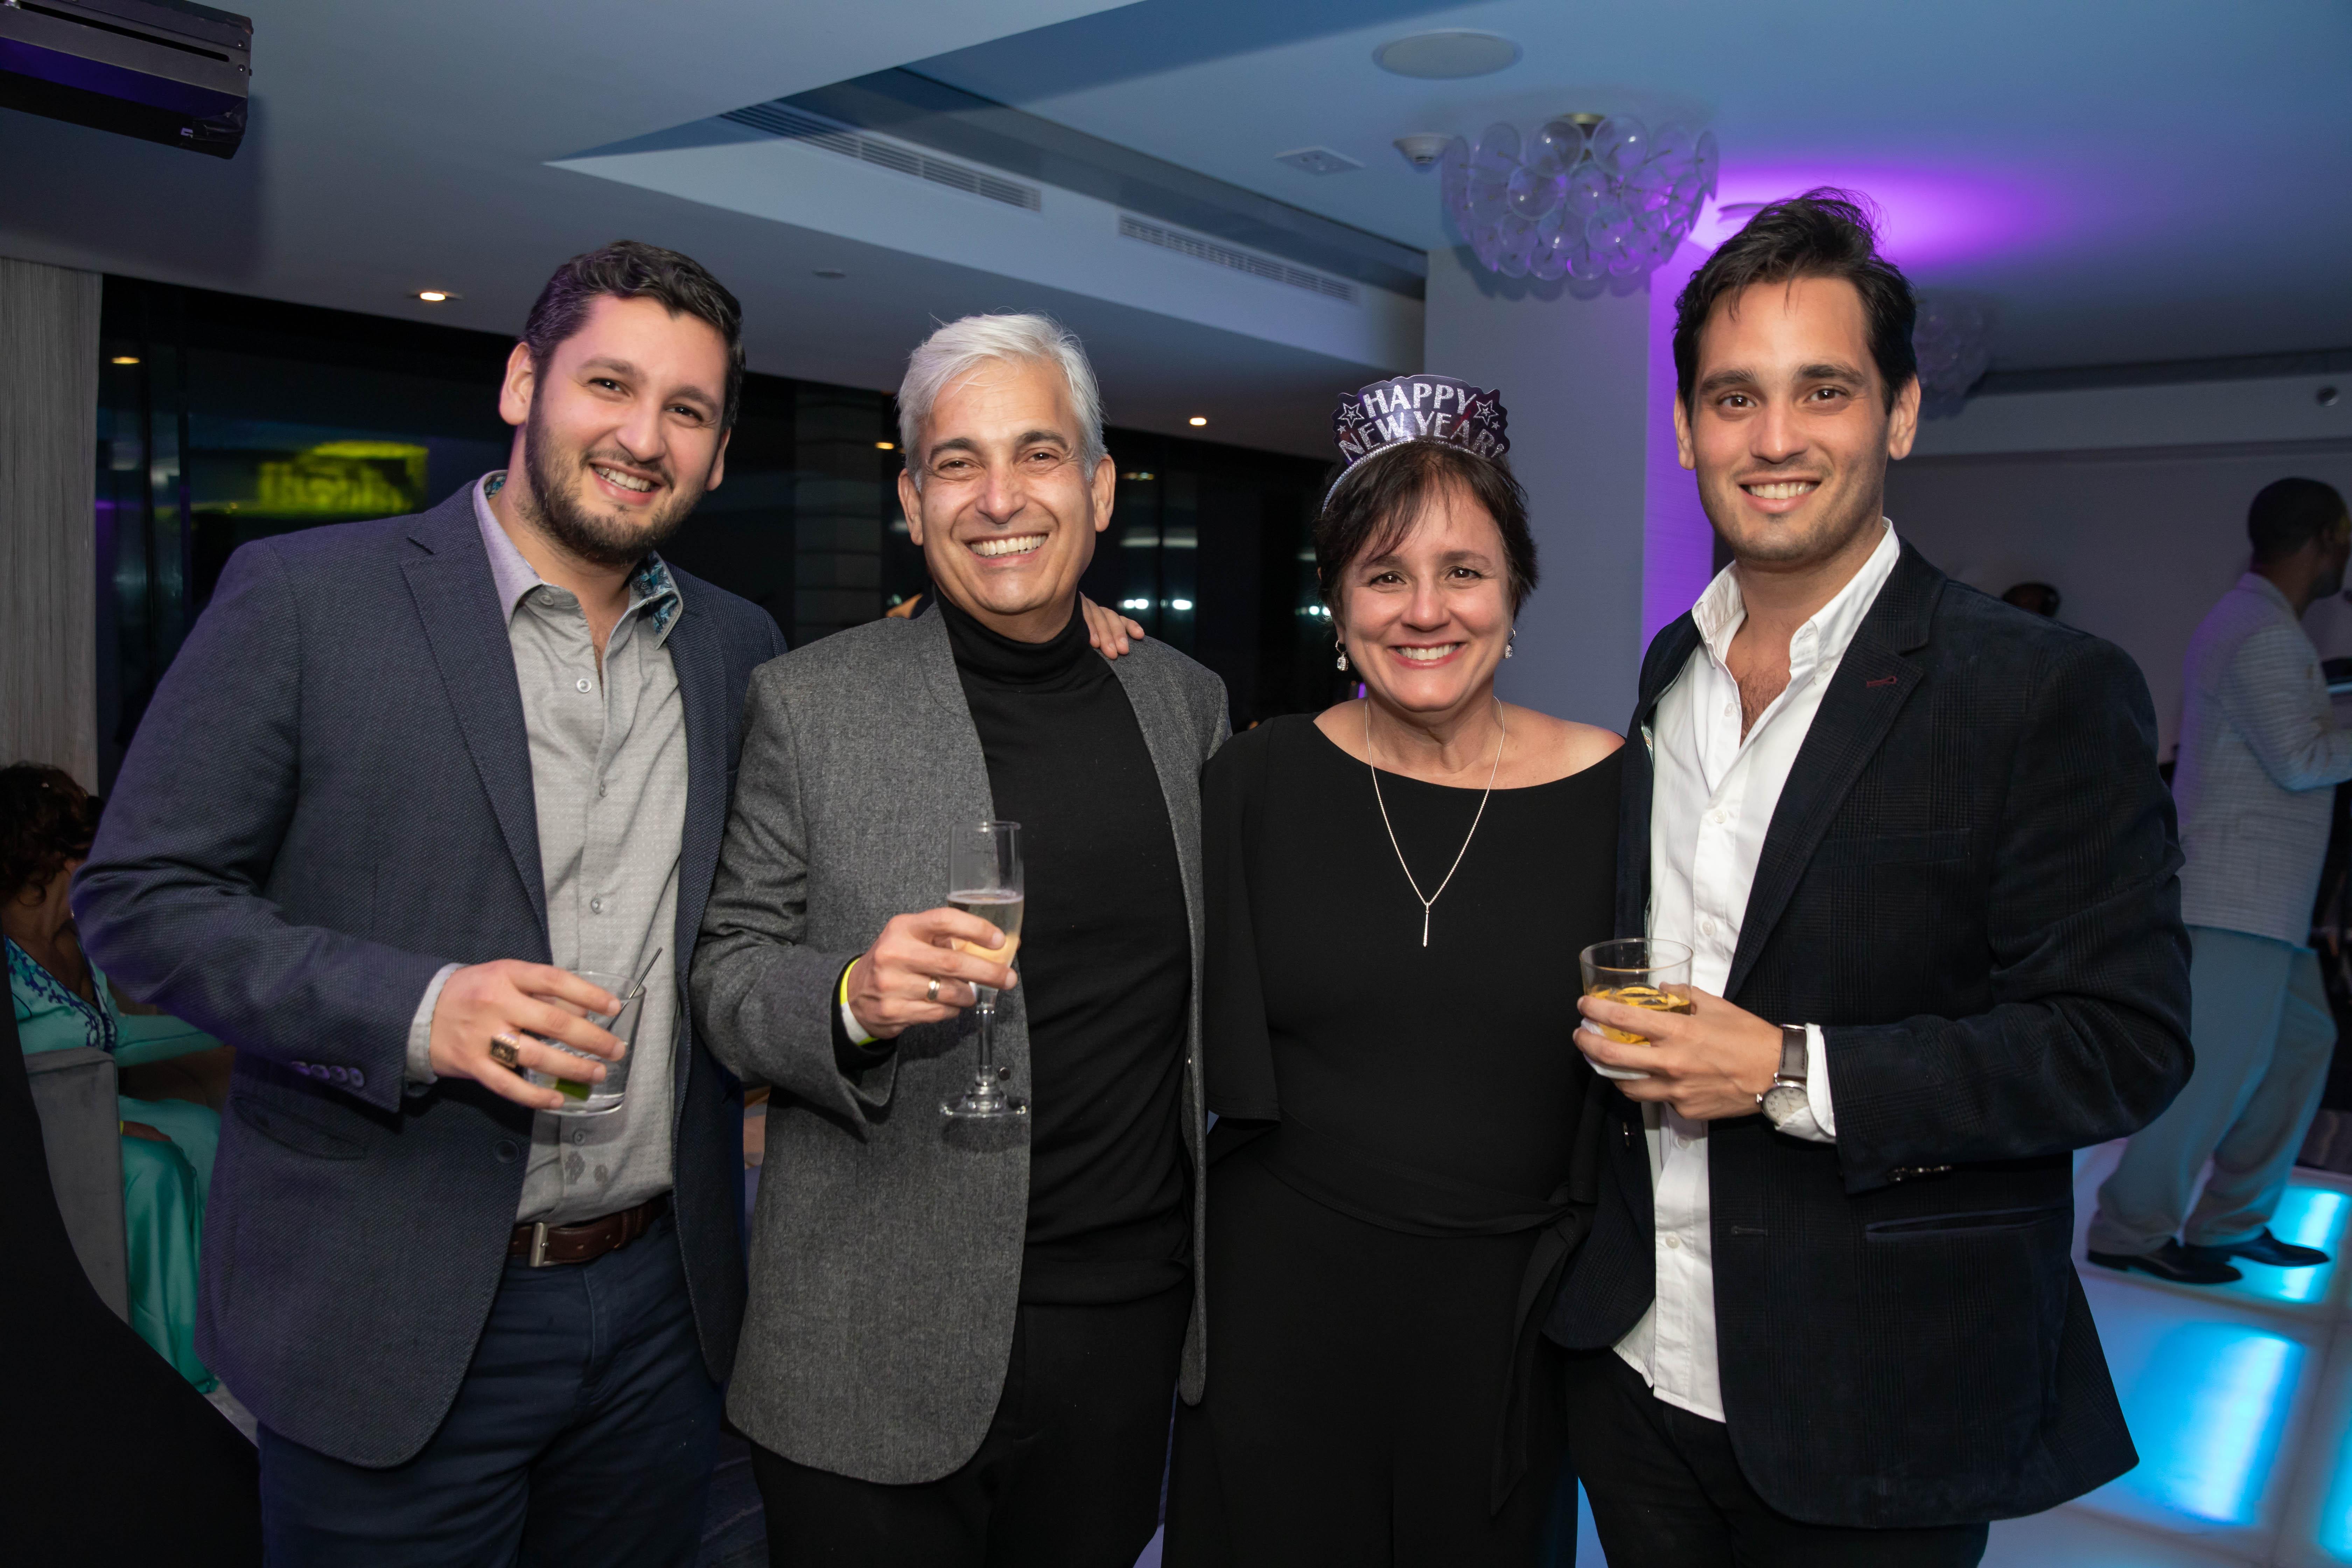 Alejandro Santana, Joe Santana, Elsa Avila y Gabriel Santana. (Suministrada)